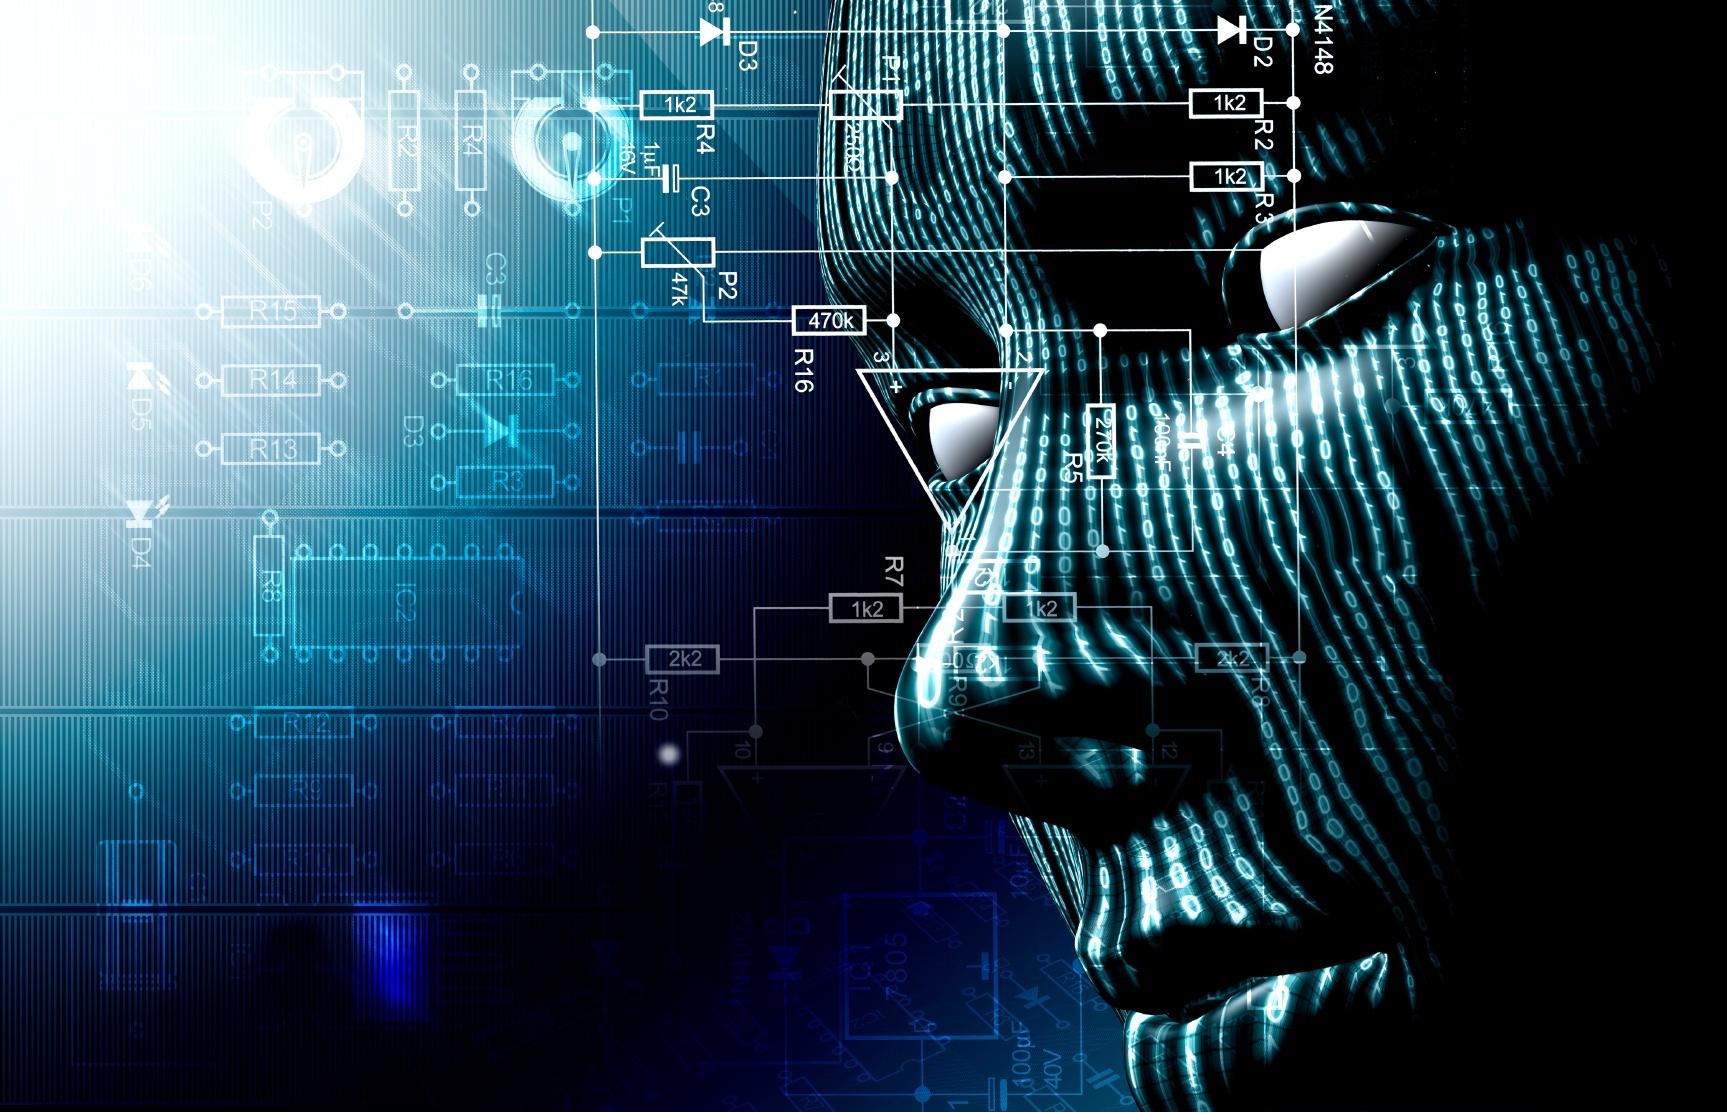 cyber-criminal-insider-threat-external-attack-psychology-privileged-user.jpg